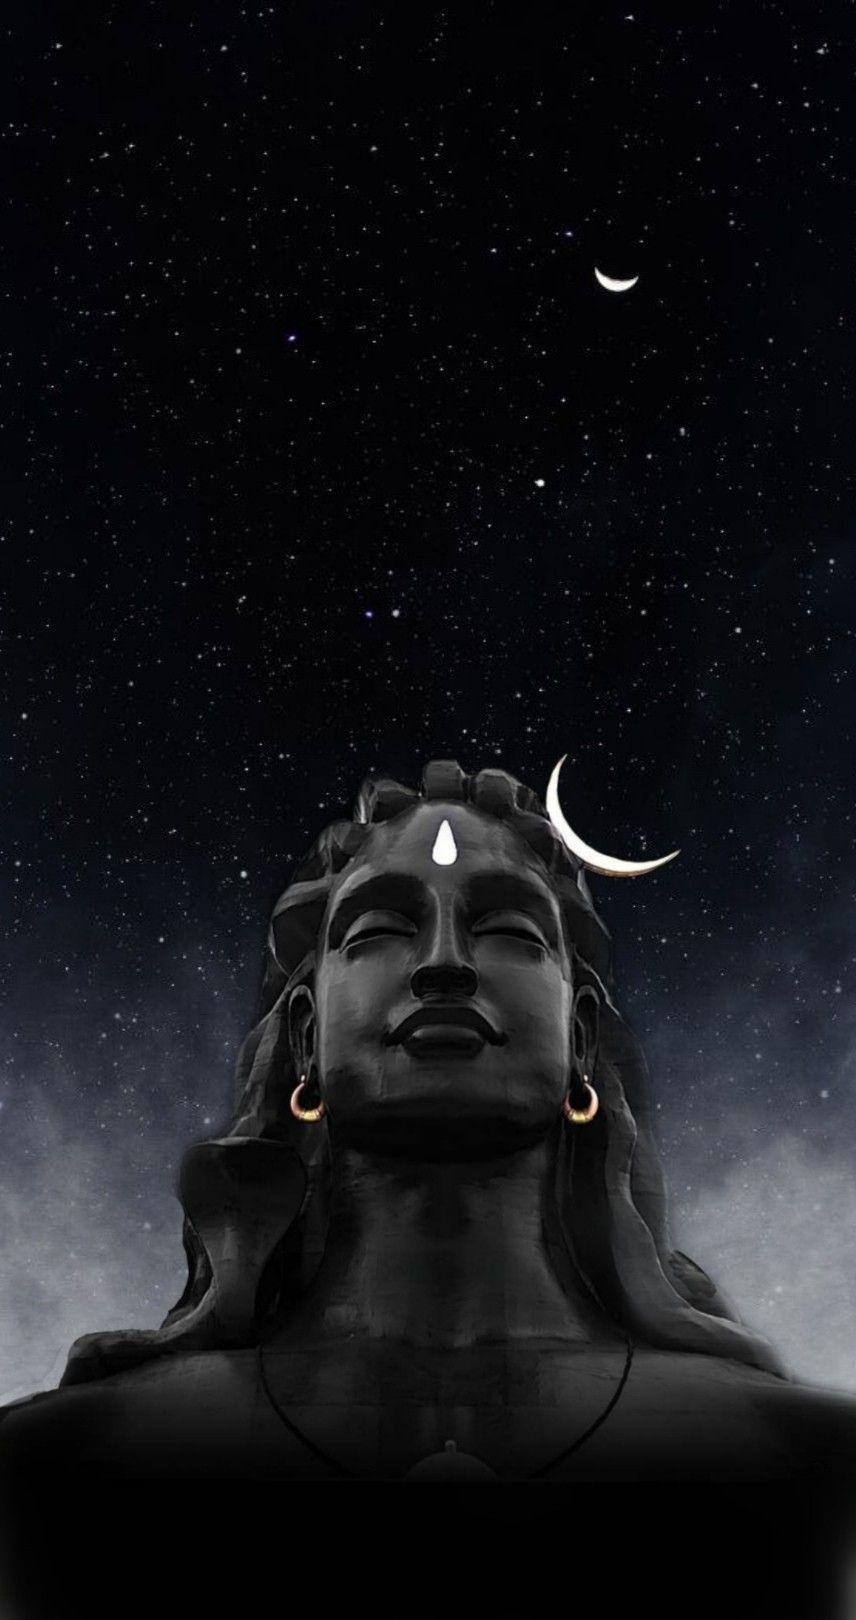 Lord Shiva Shiva Lord Wallpapers Lord Shiva Hd Wallpaper Rudra Shiva